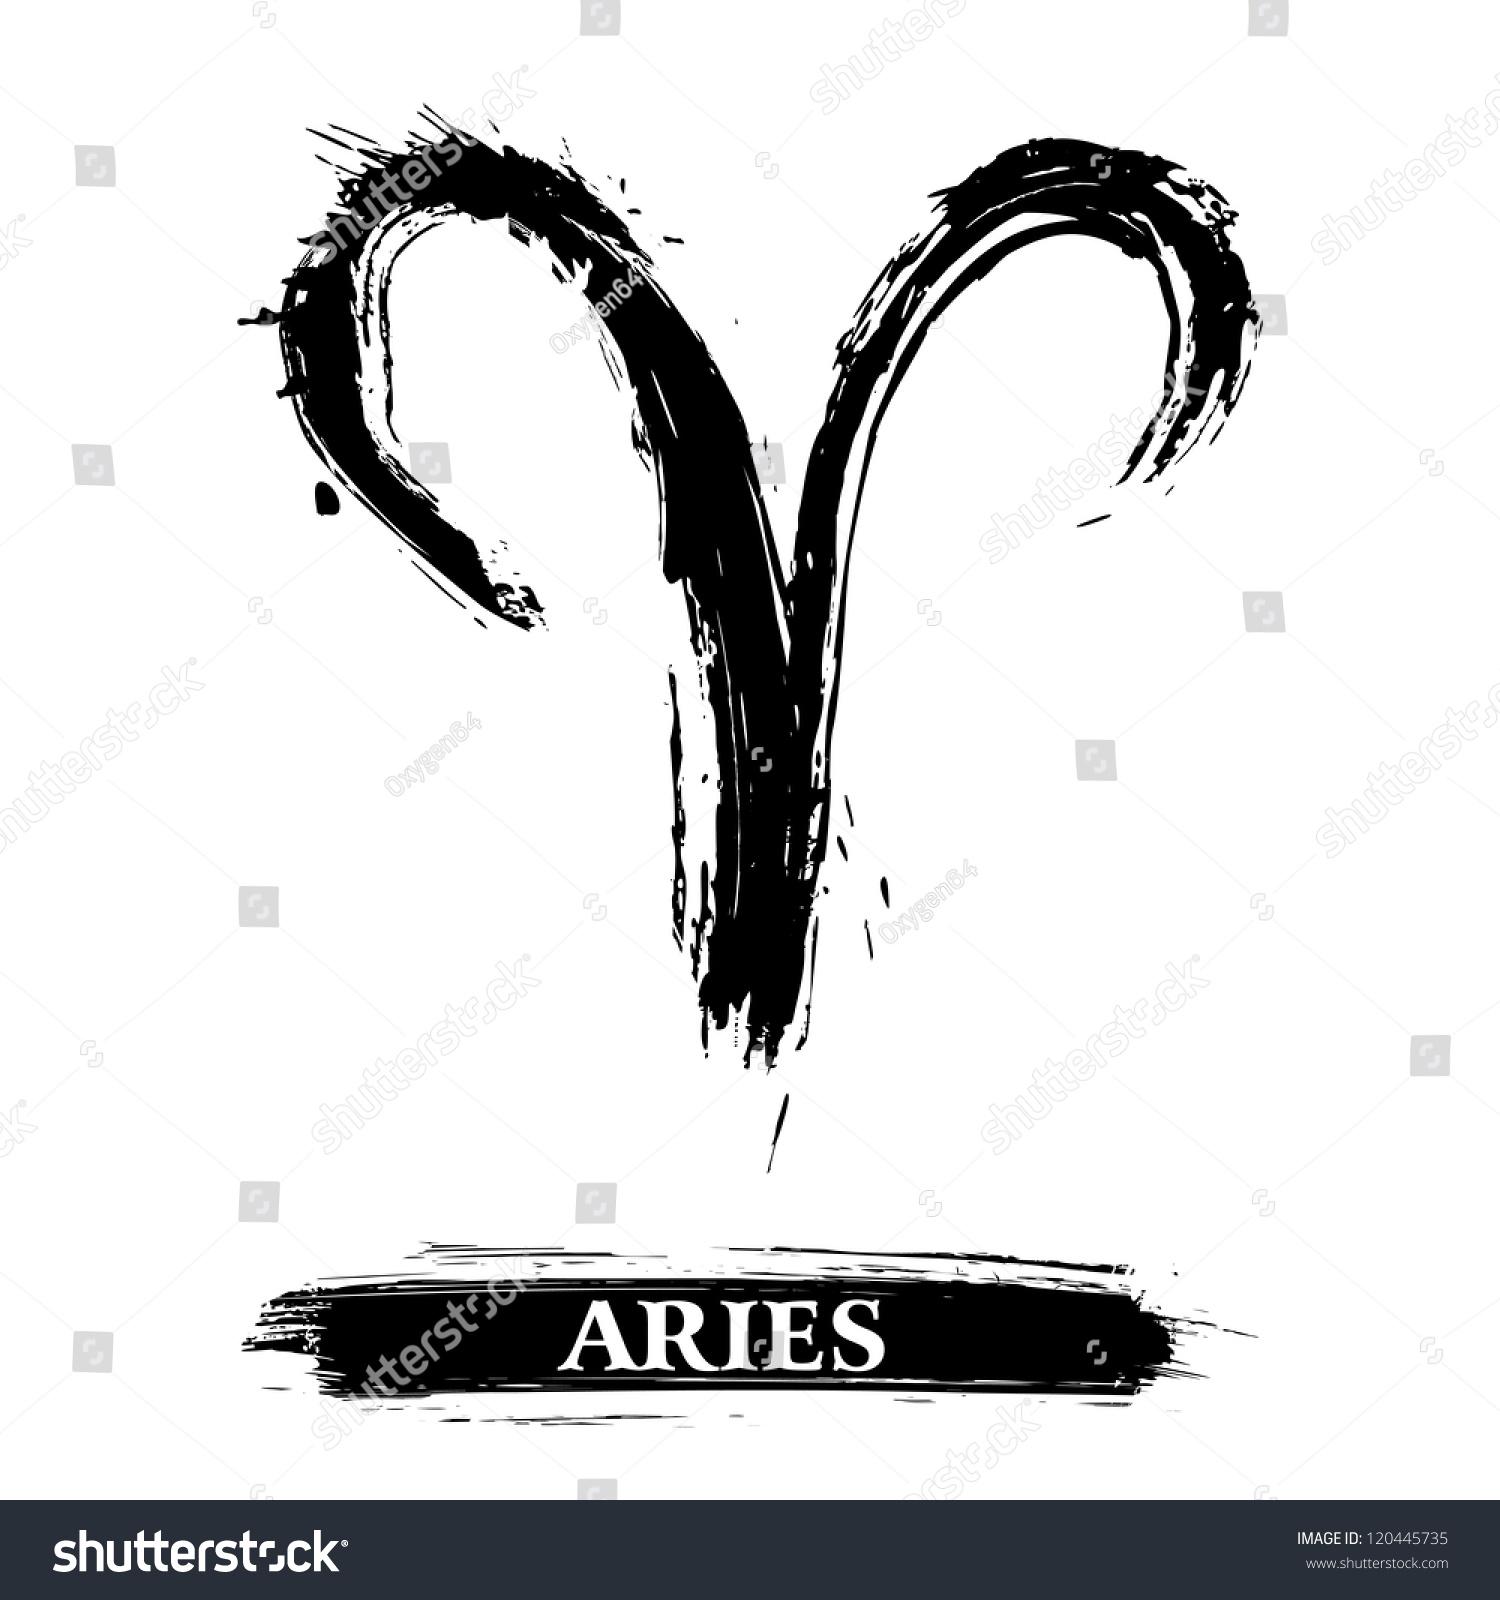 Aries symbol stock photo photo vector illustration 120445735 aries symbol publicscrutiny Image collections